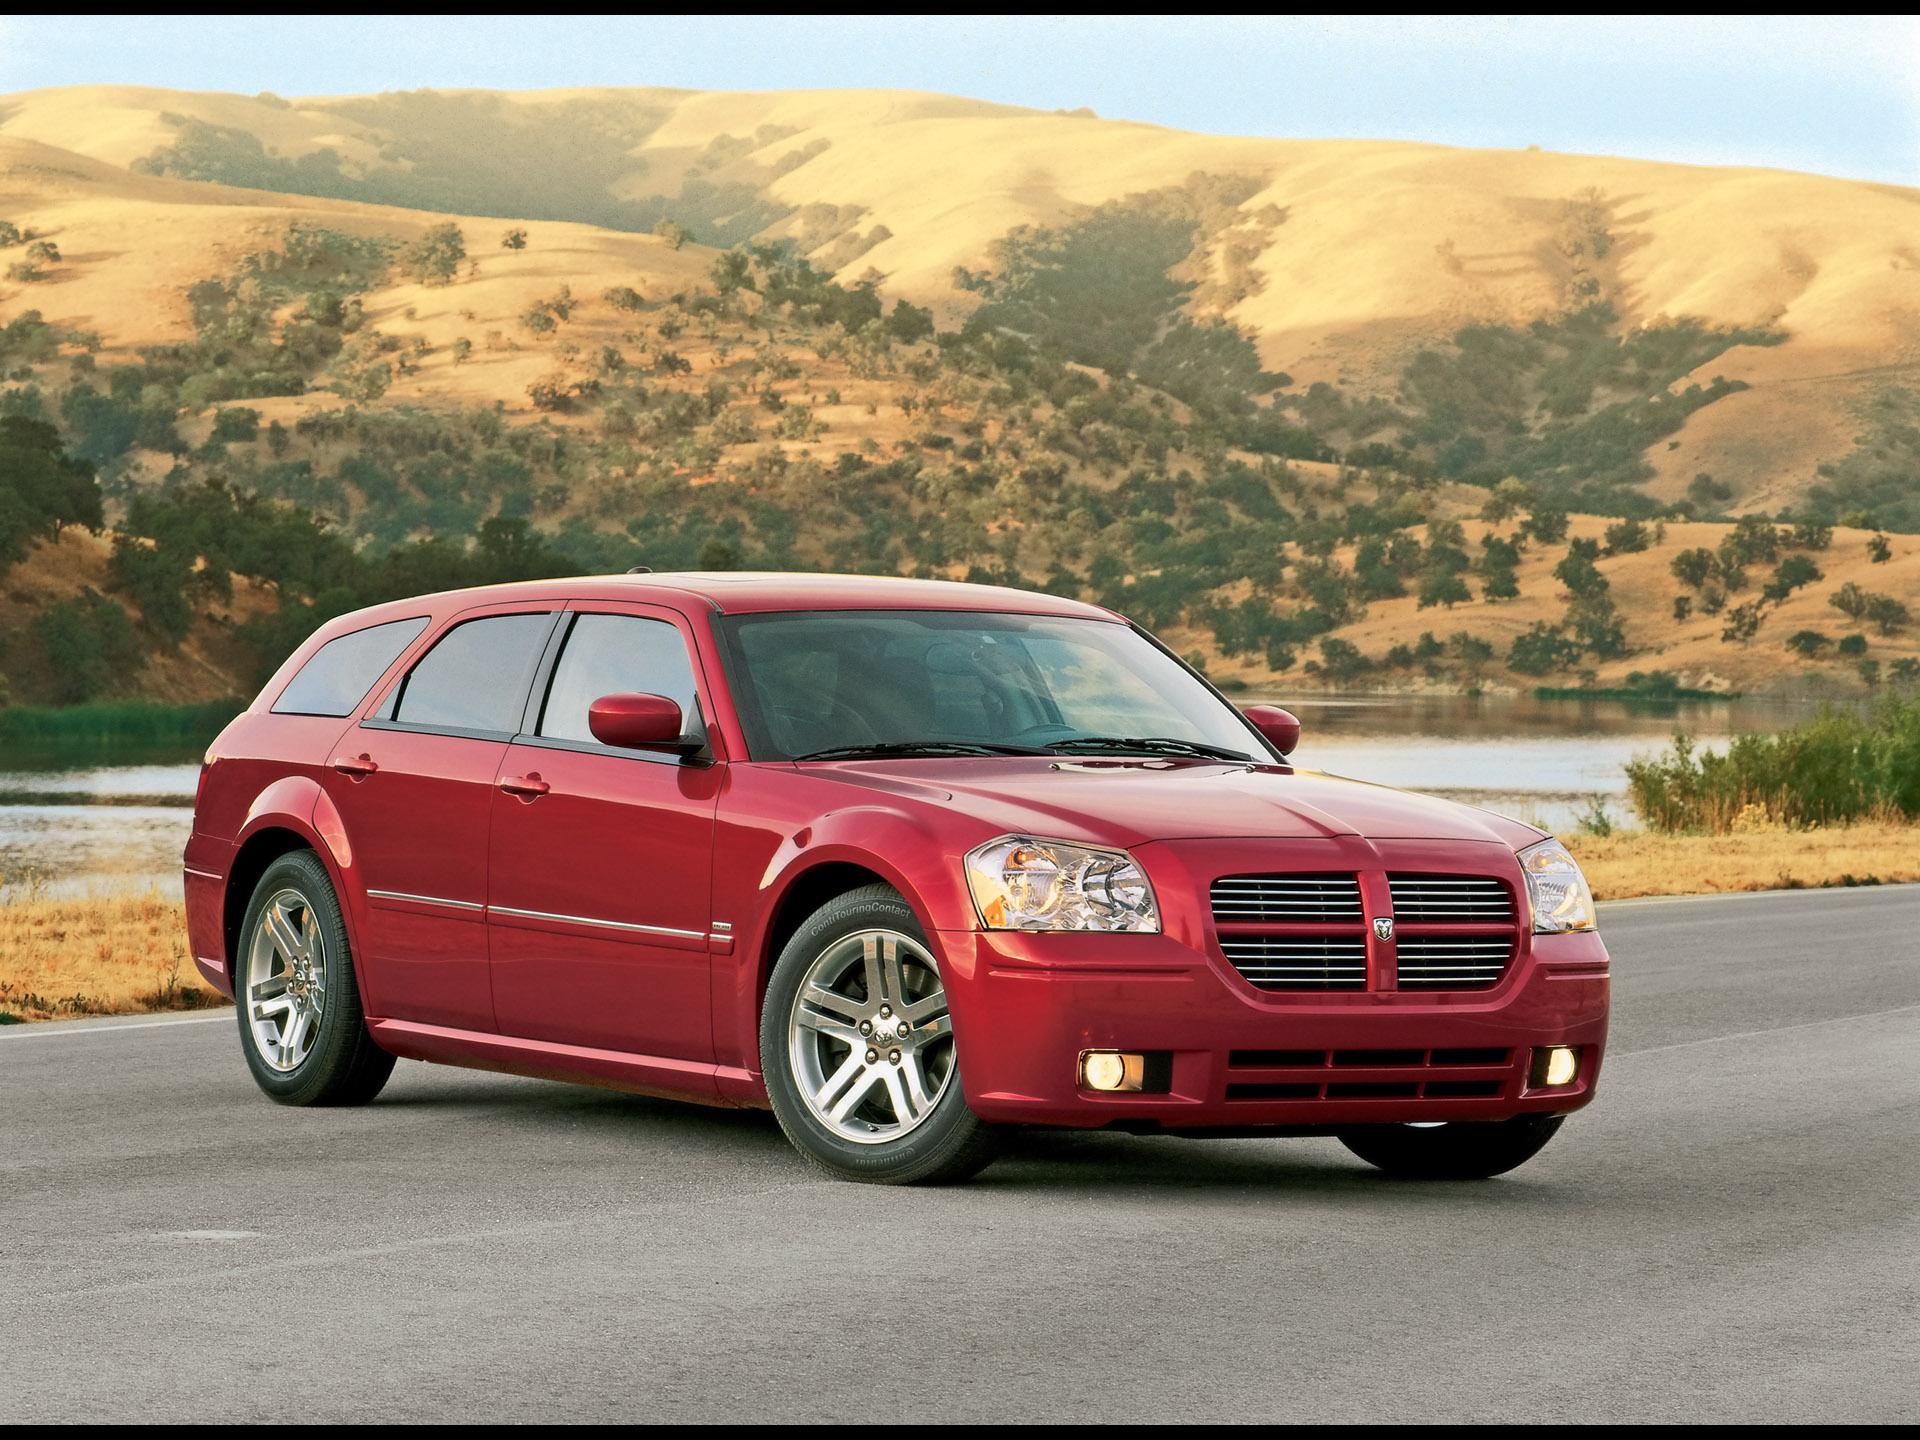 2005 Dodge Magnum Vin Check Specs Recalls Autodetective